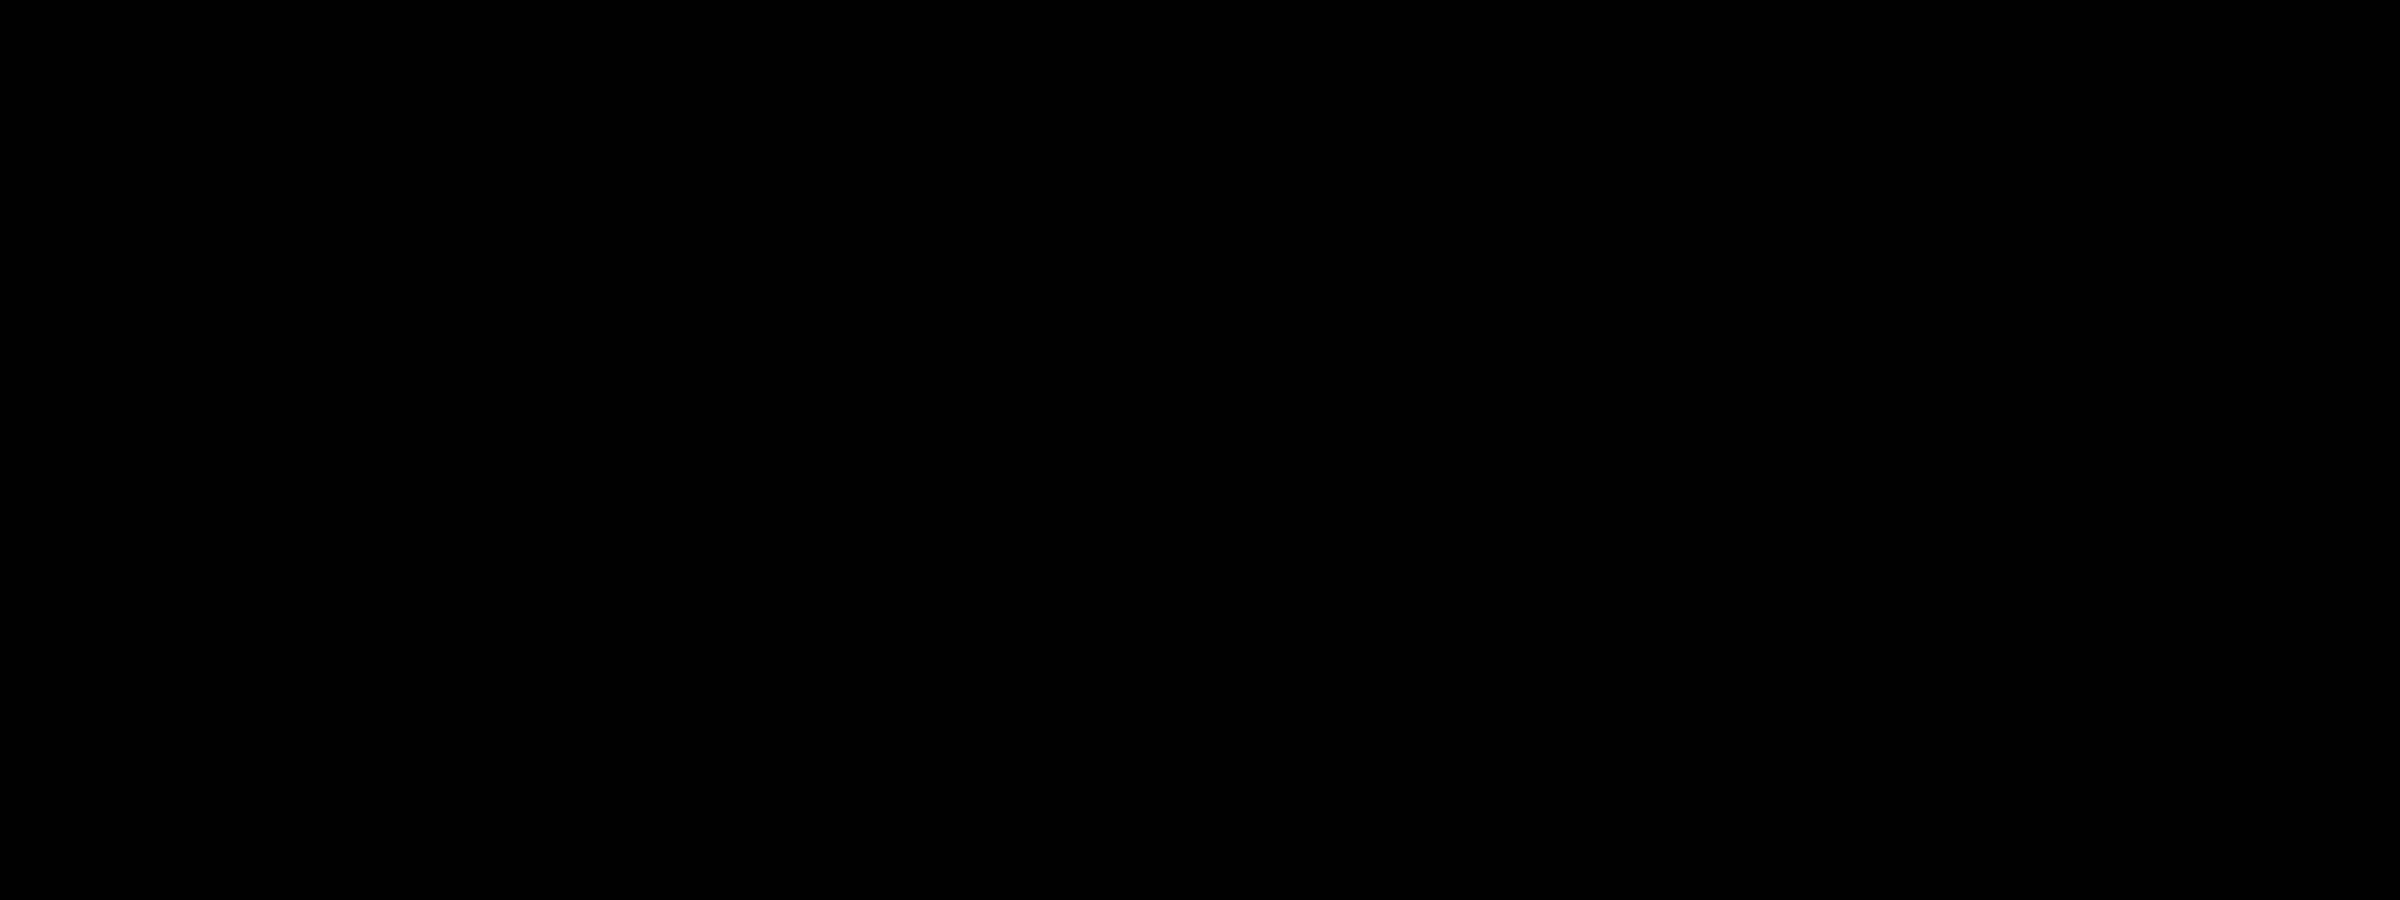 2400x900 Clipart